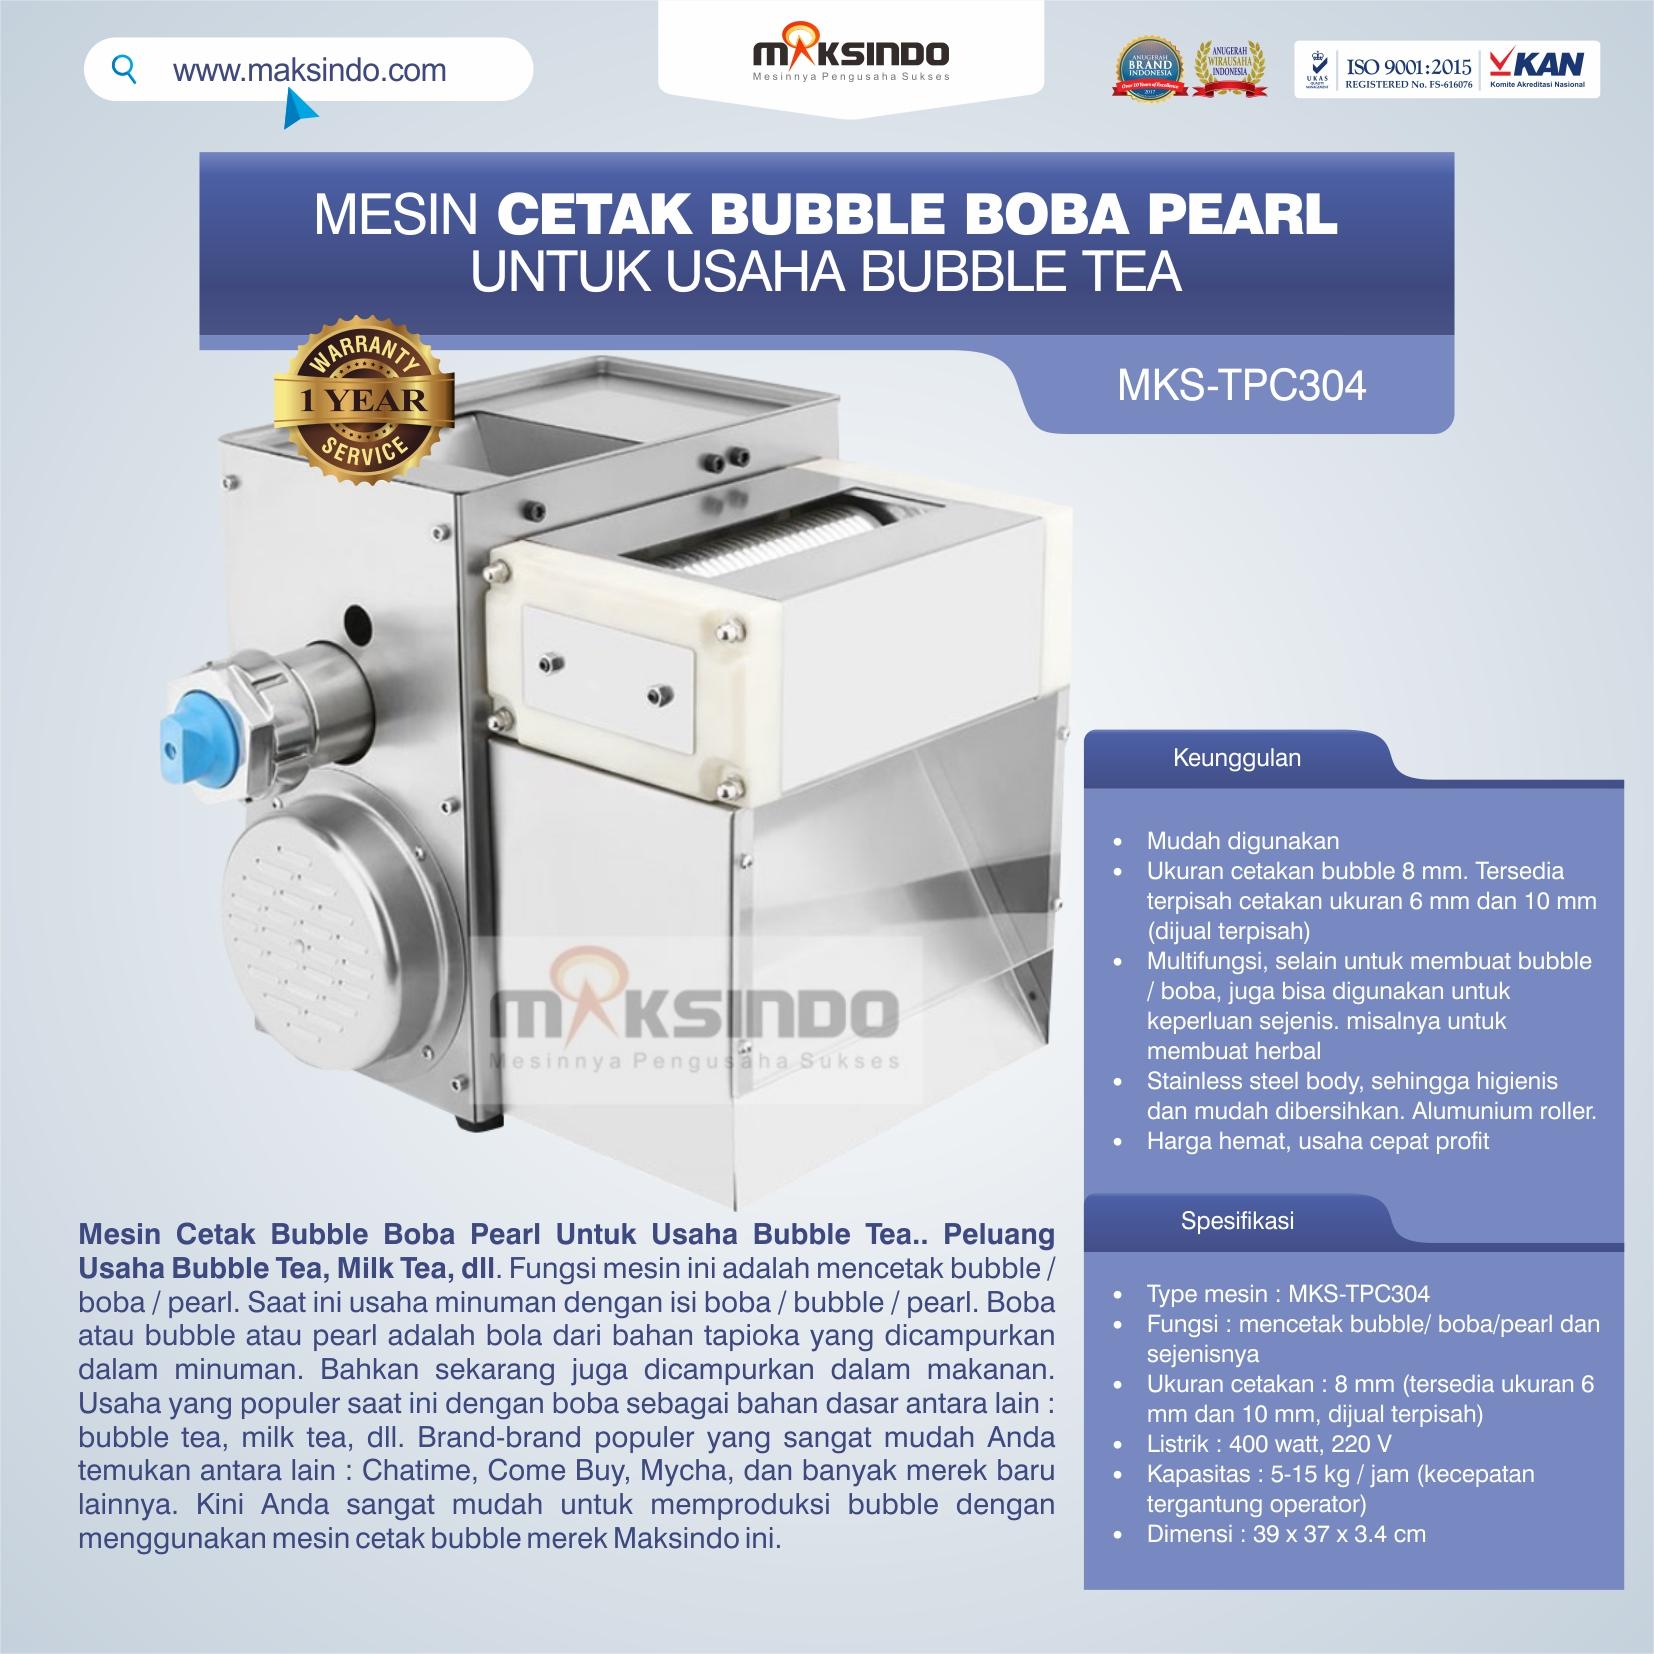 Jual Mesin Cetak Bubble Boba Pearl Untuk Usaha Bubble Tea di Banjarmasin